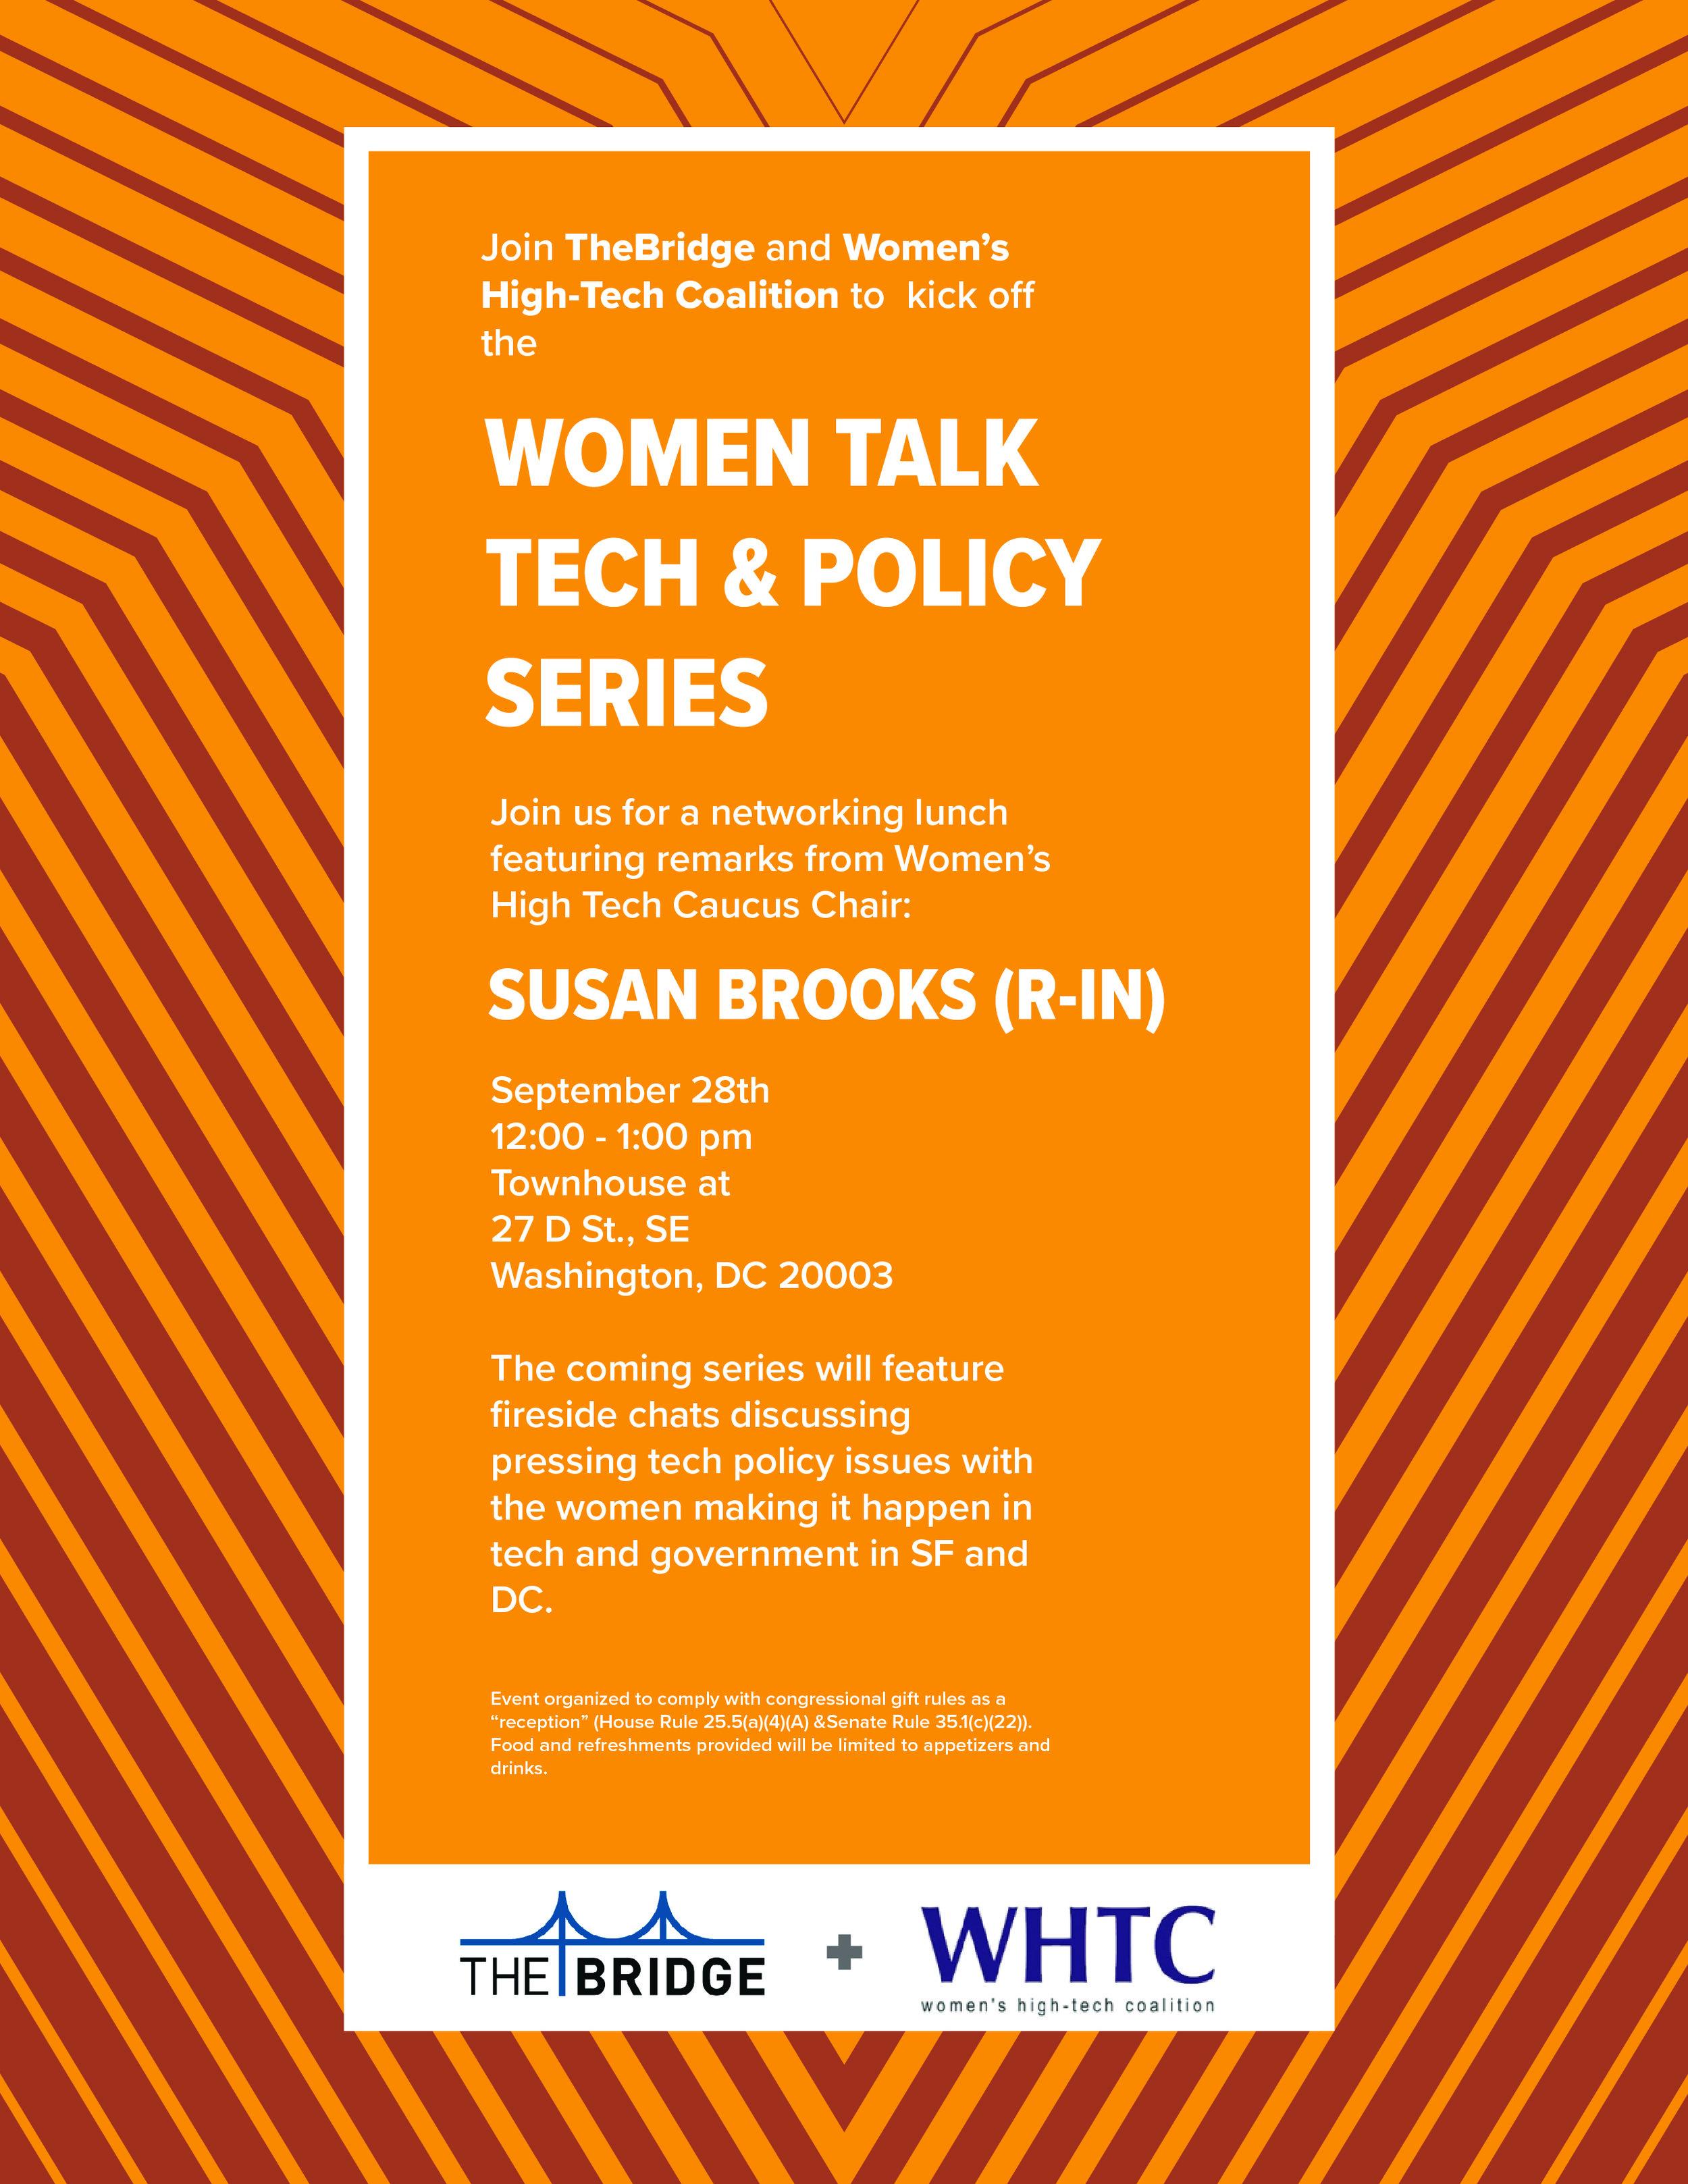 WomenTalkTechandPolicy19.JPG